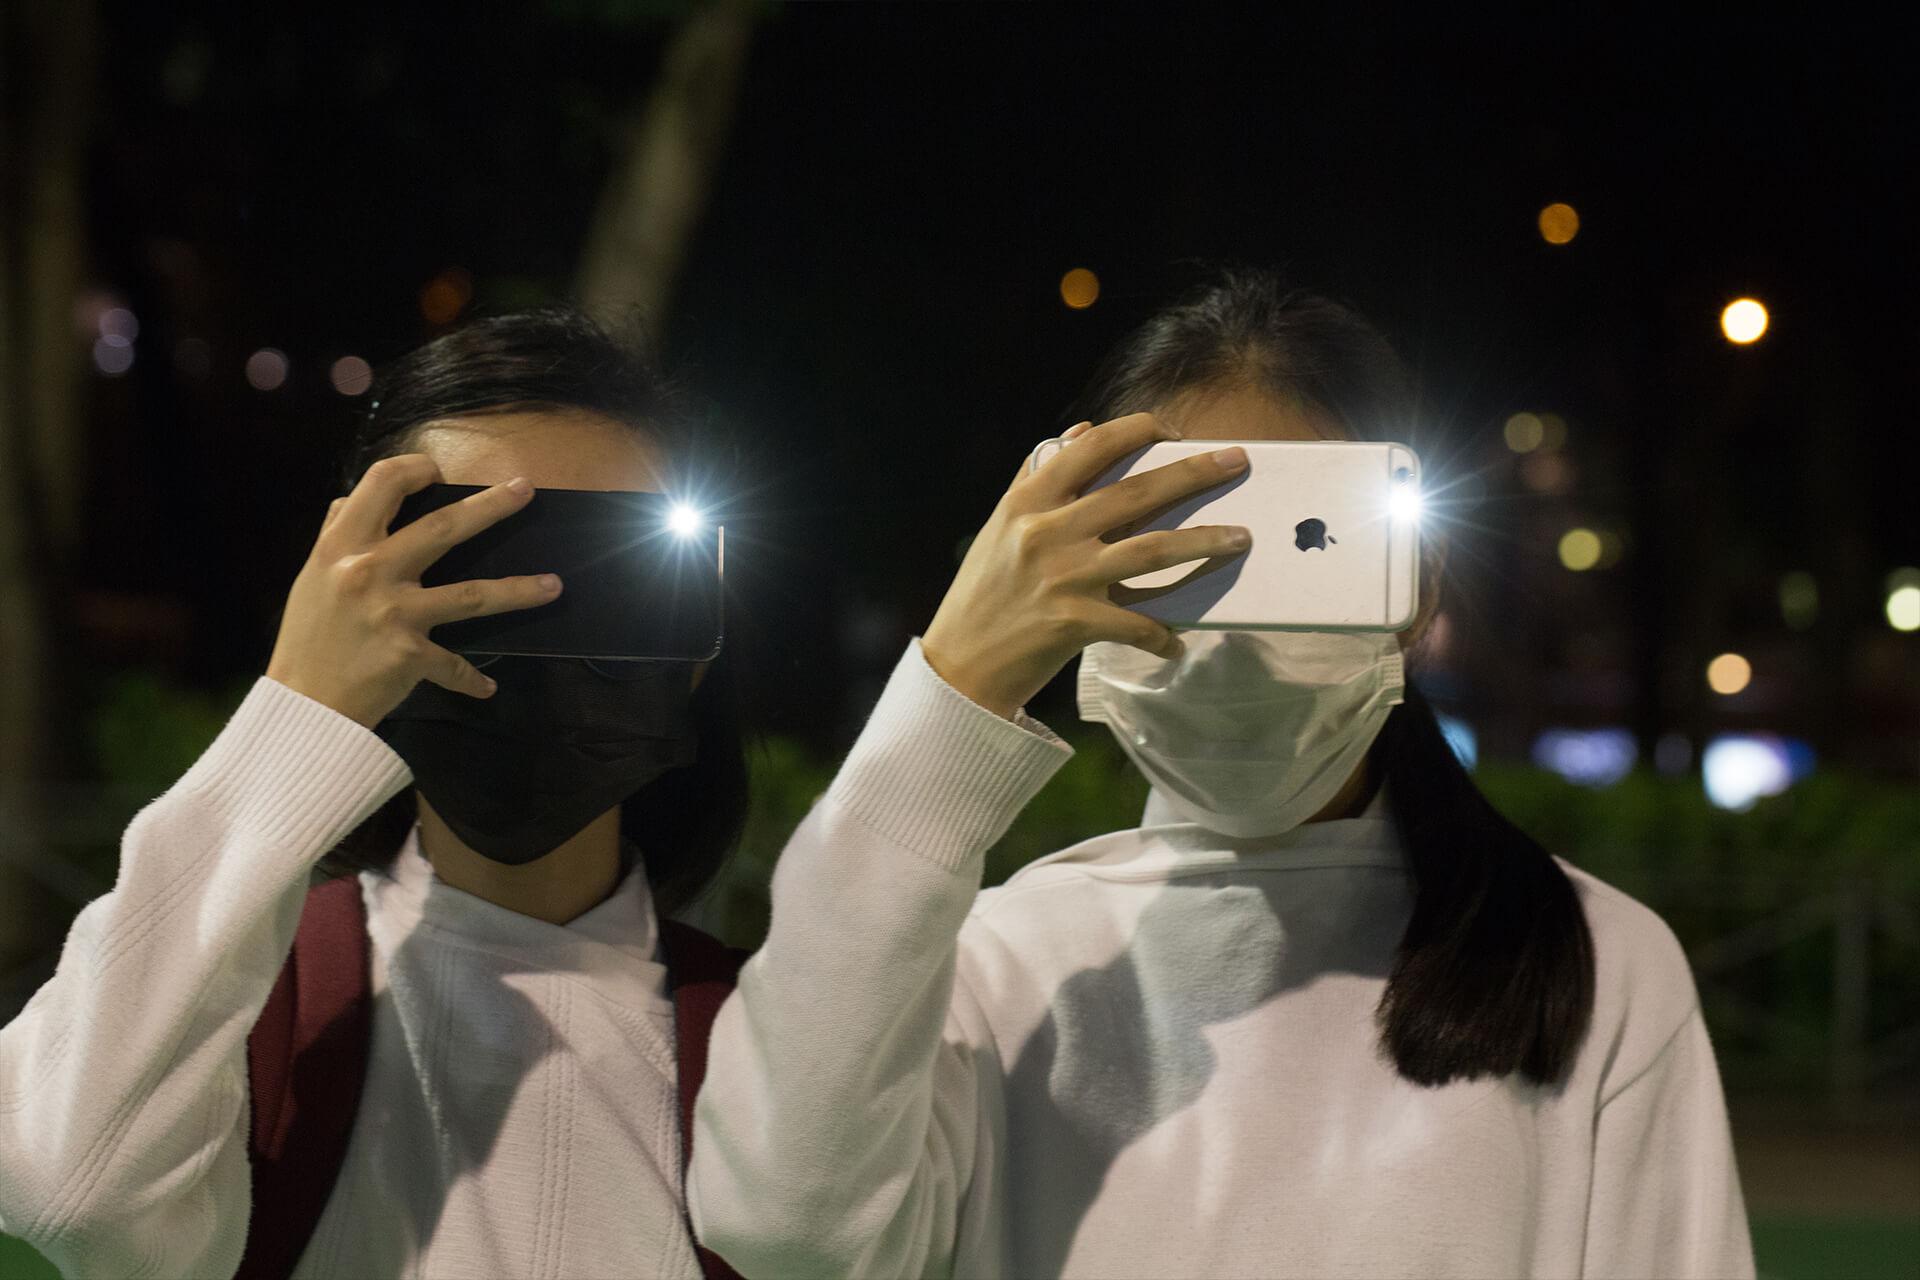 Hoaa(左)與她的朋友穿著校服參與網民發起的「球迷大和解」人鏈大合唱活動。以往她很討厭大合唱,現在卻從大家的歌聲得到力量。